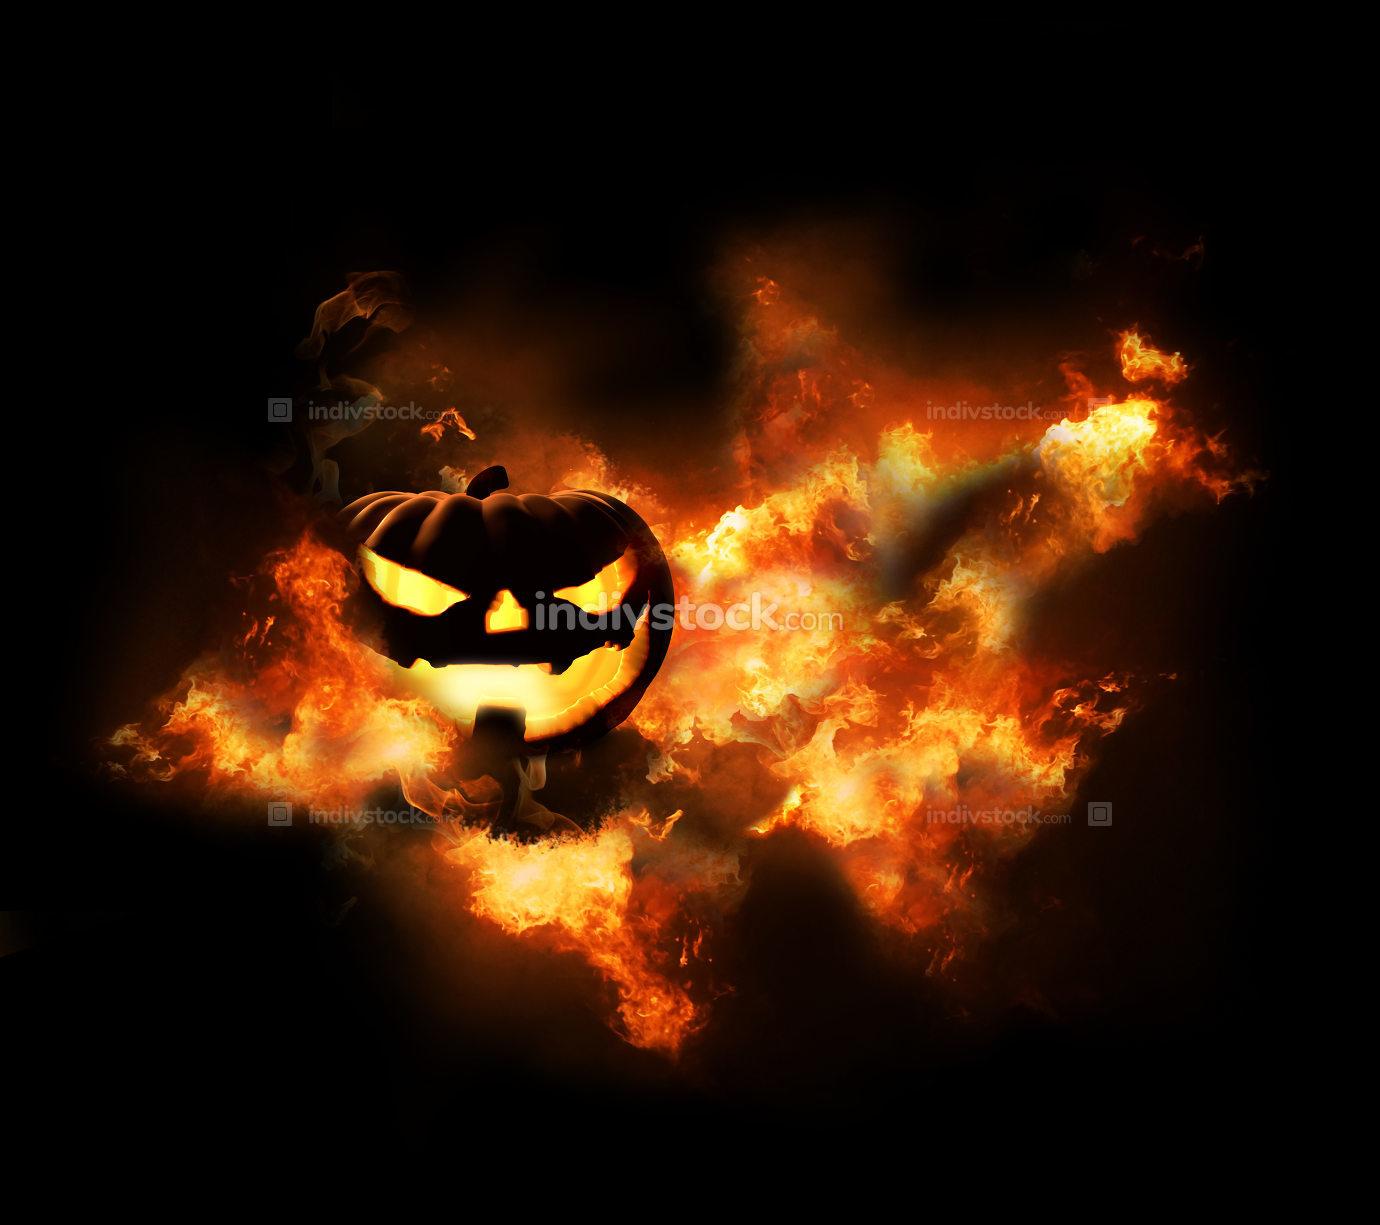 free download: Halloween flames background 3d rendering